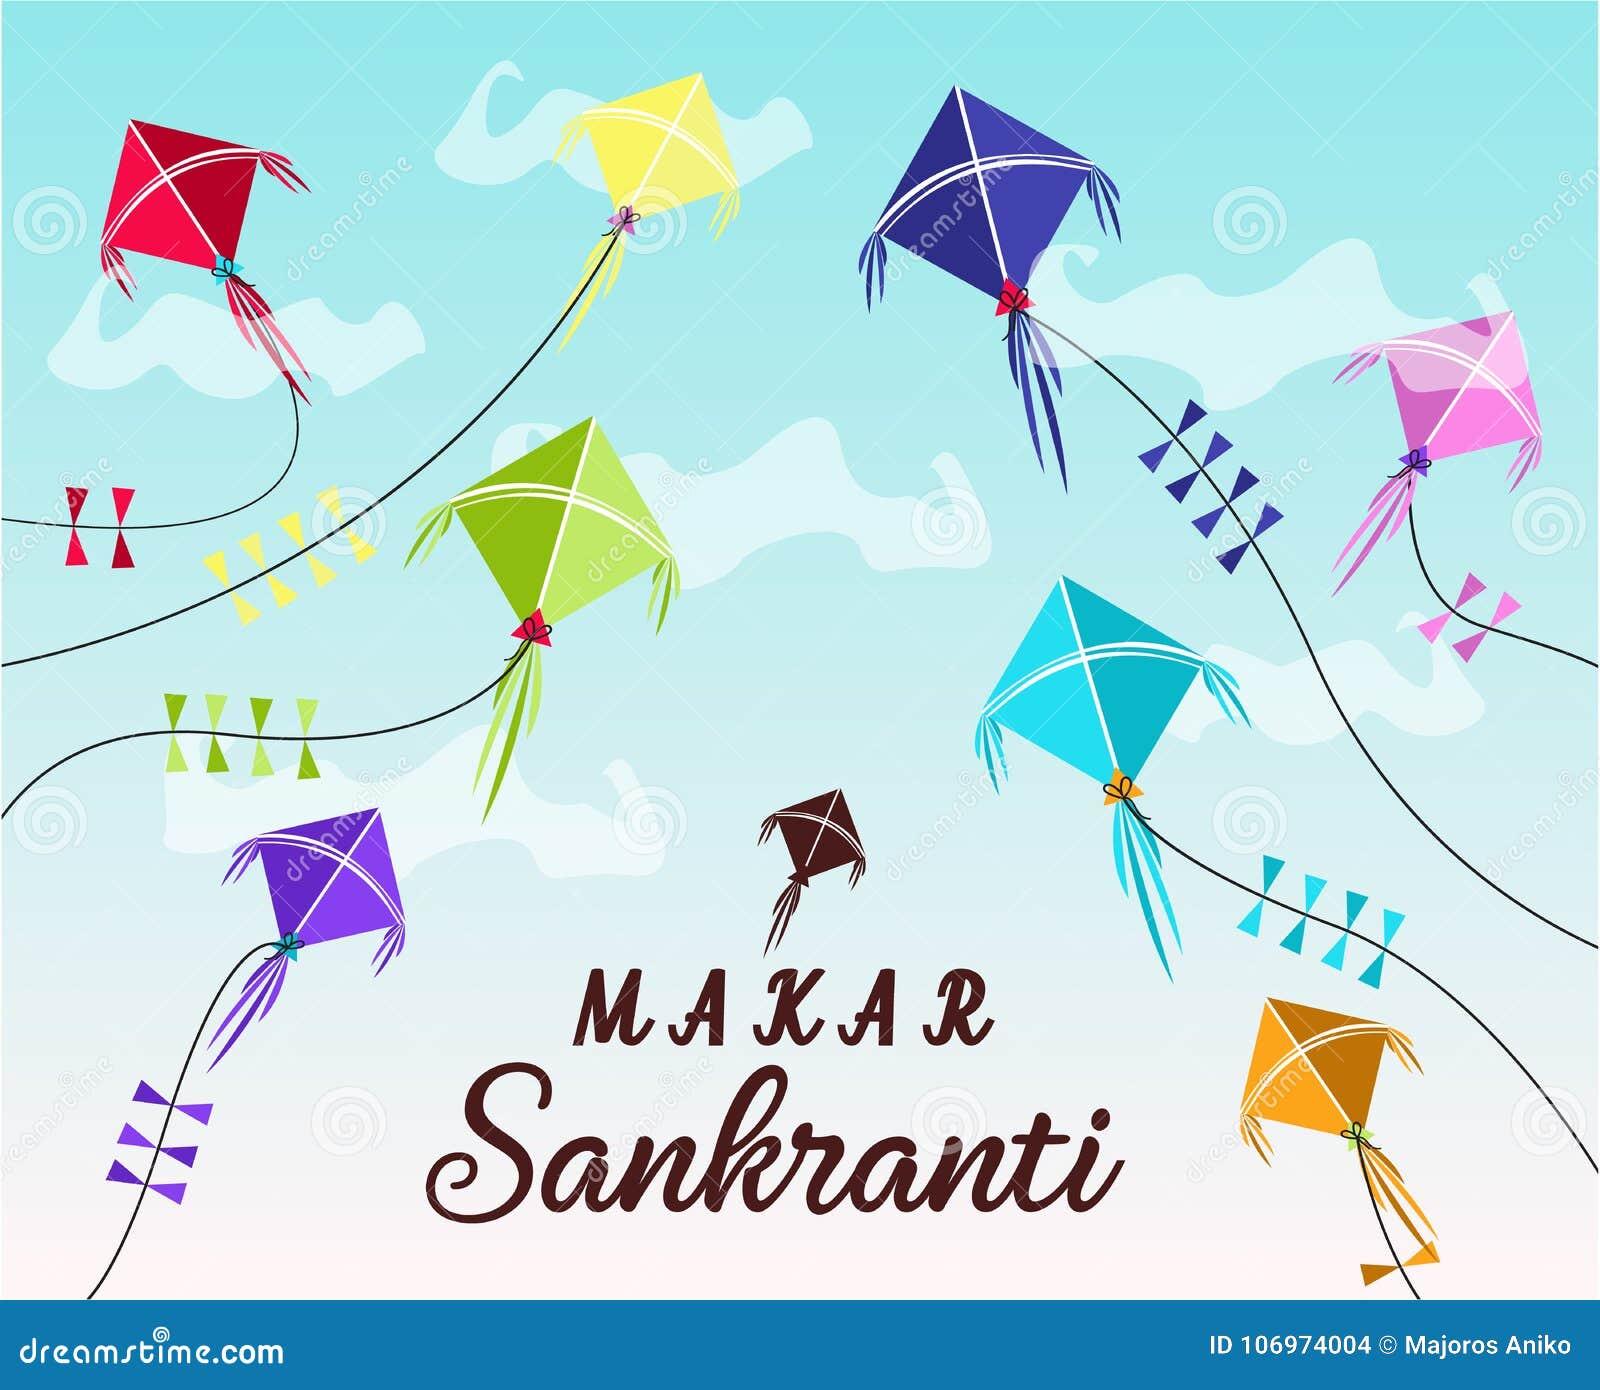 Happy makar sankranti card stock vector illustration of pongal happy makar sankranti greeting card or background vector illustration m4hsunfo